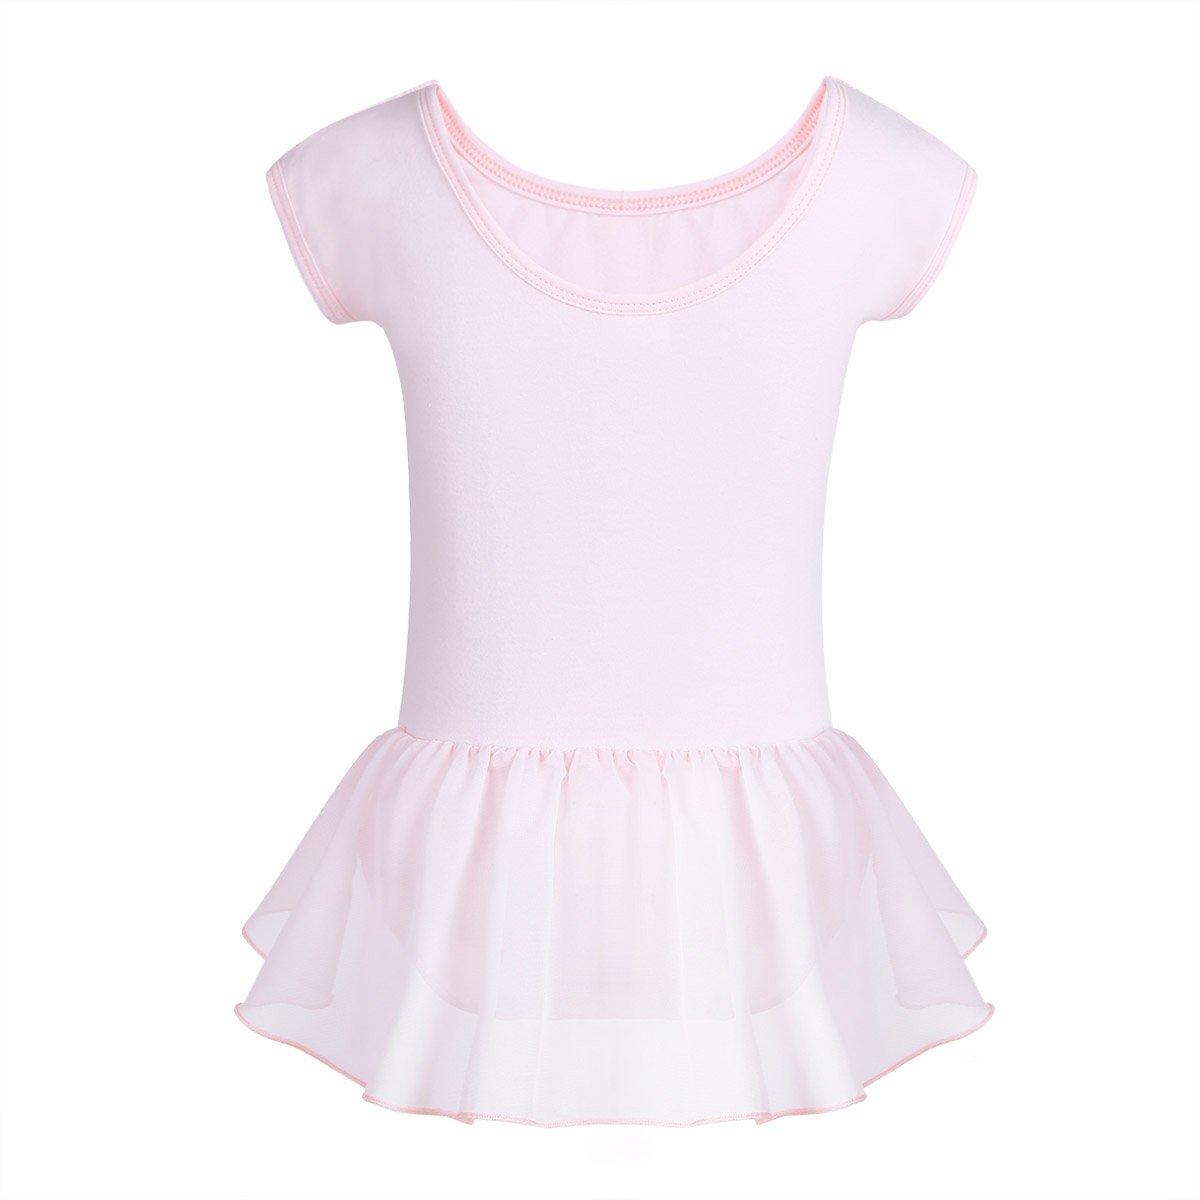 9d84b7f56231 iiniim Kids Girls Chiffon Raglan Cap Sleeves Ballet Dance Gymnastics ...